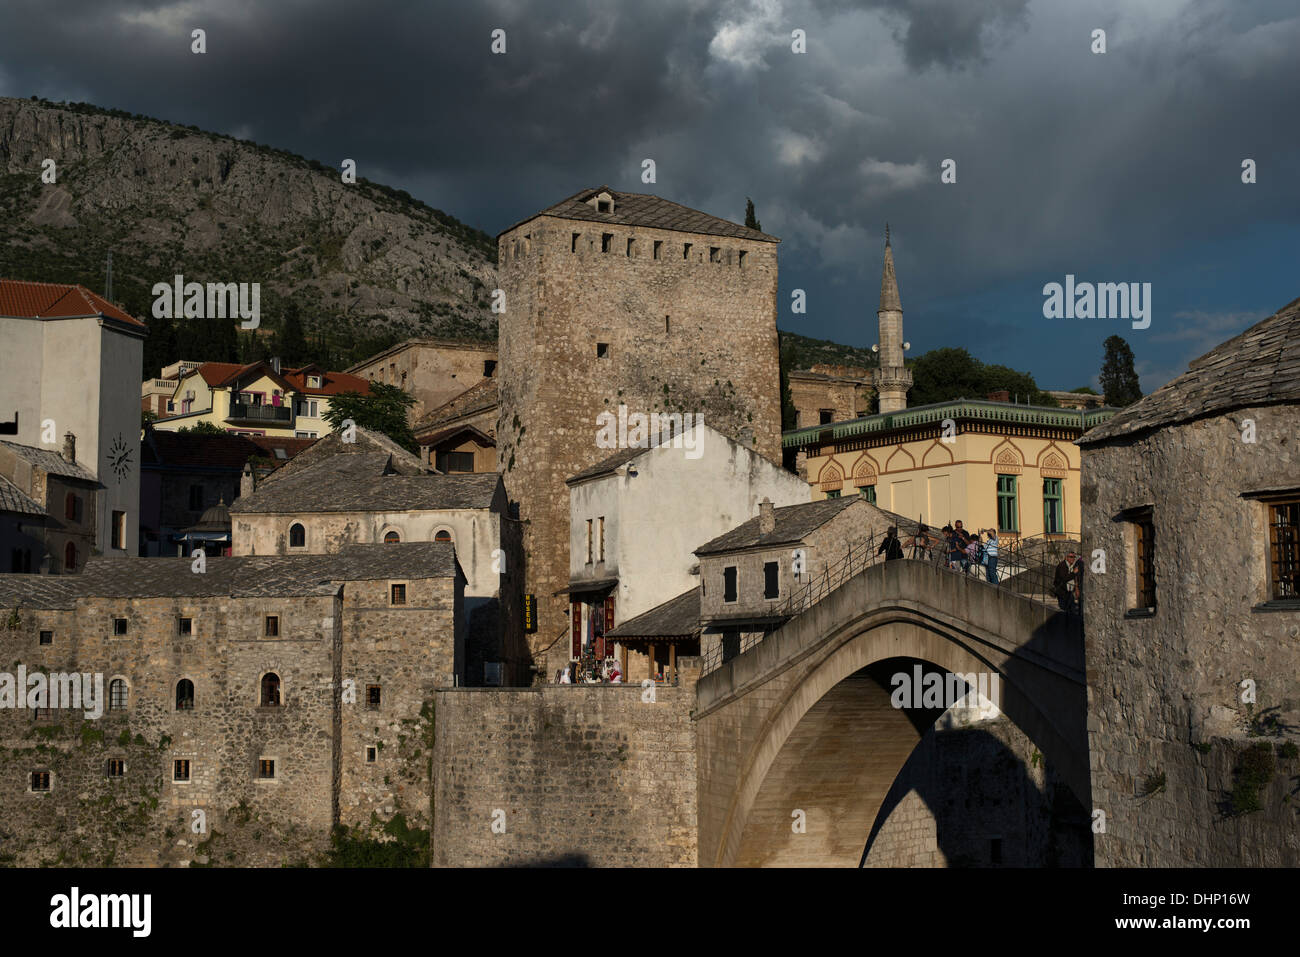 The beautiful old ( rebuilt after the war ) Mostar bridge. - Stock Image